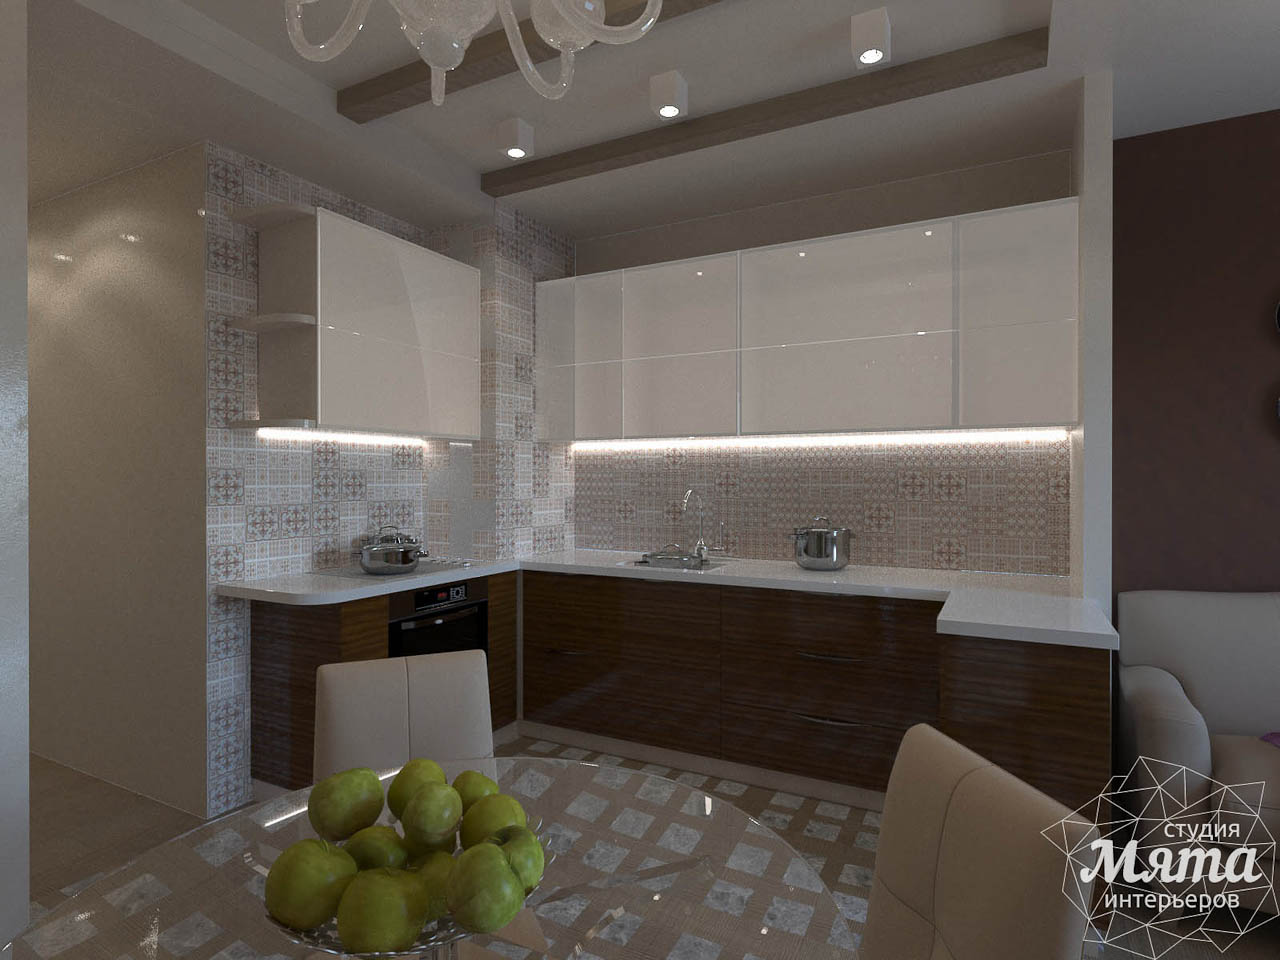 Дизайн интерьера трехкомнатной квартиры по ул. Мельникова 27 img1732758652